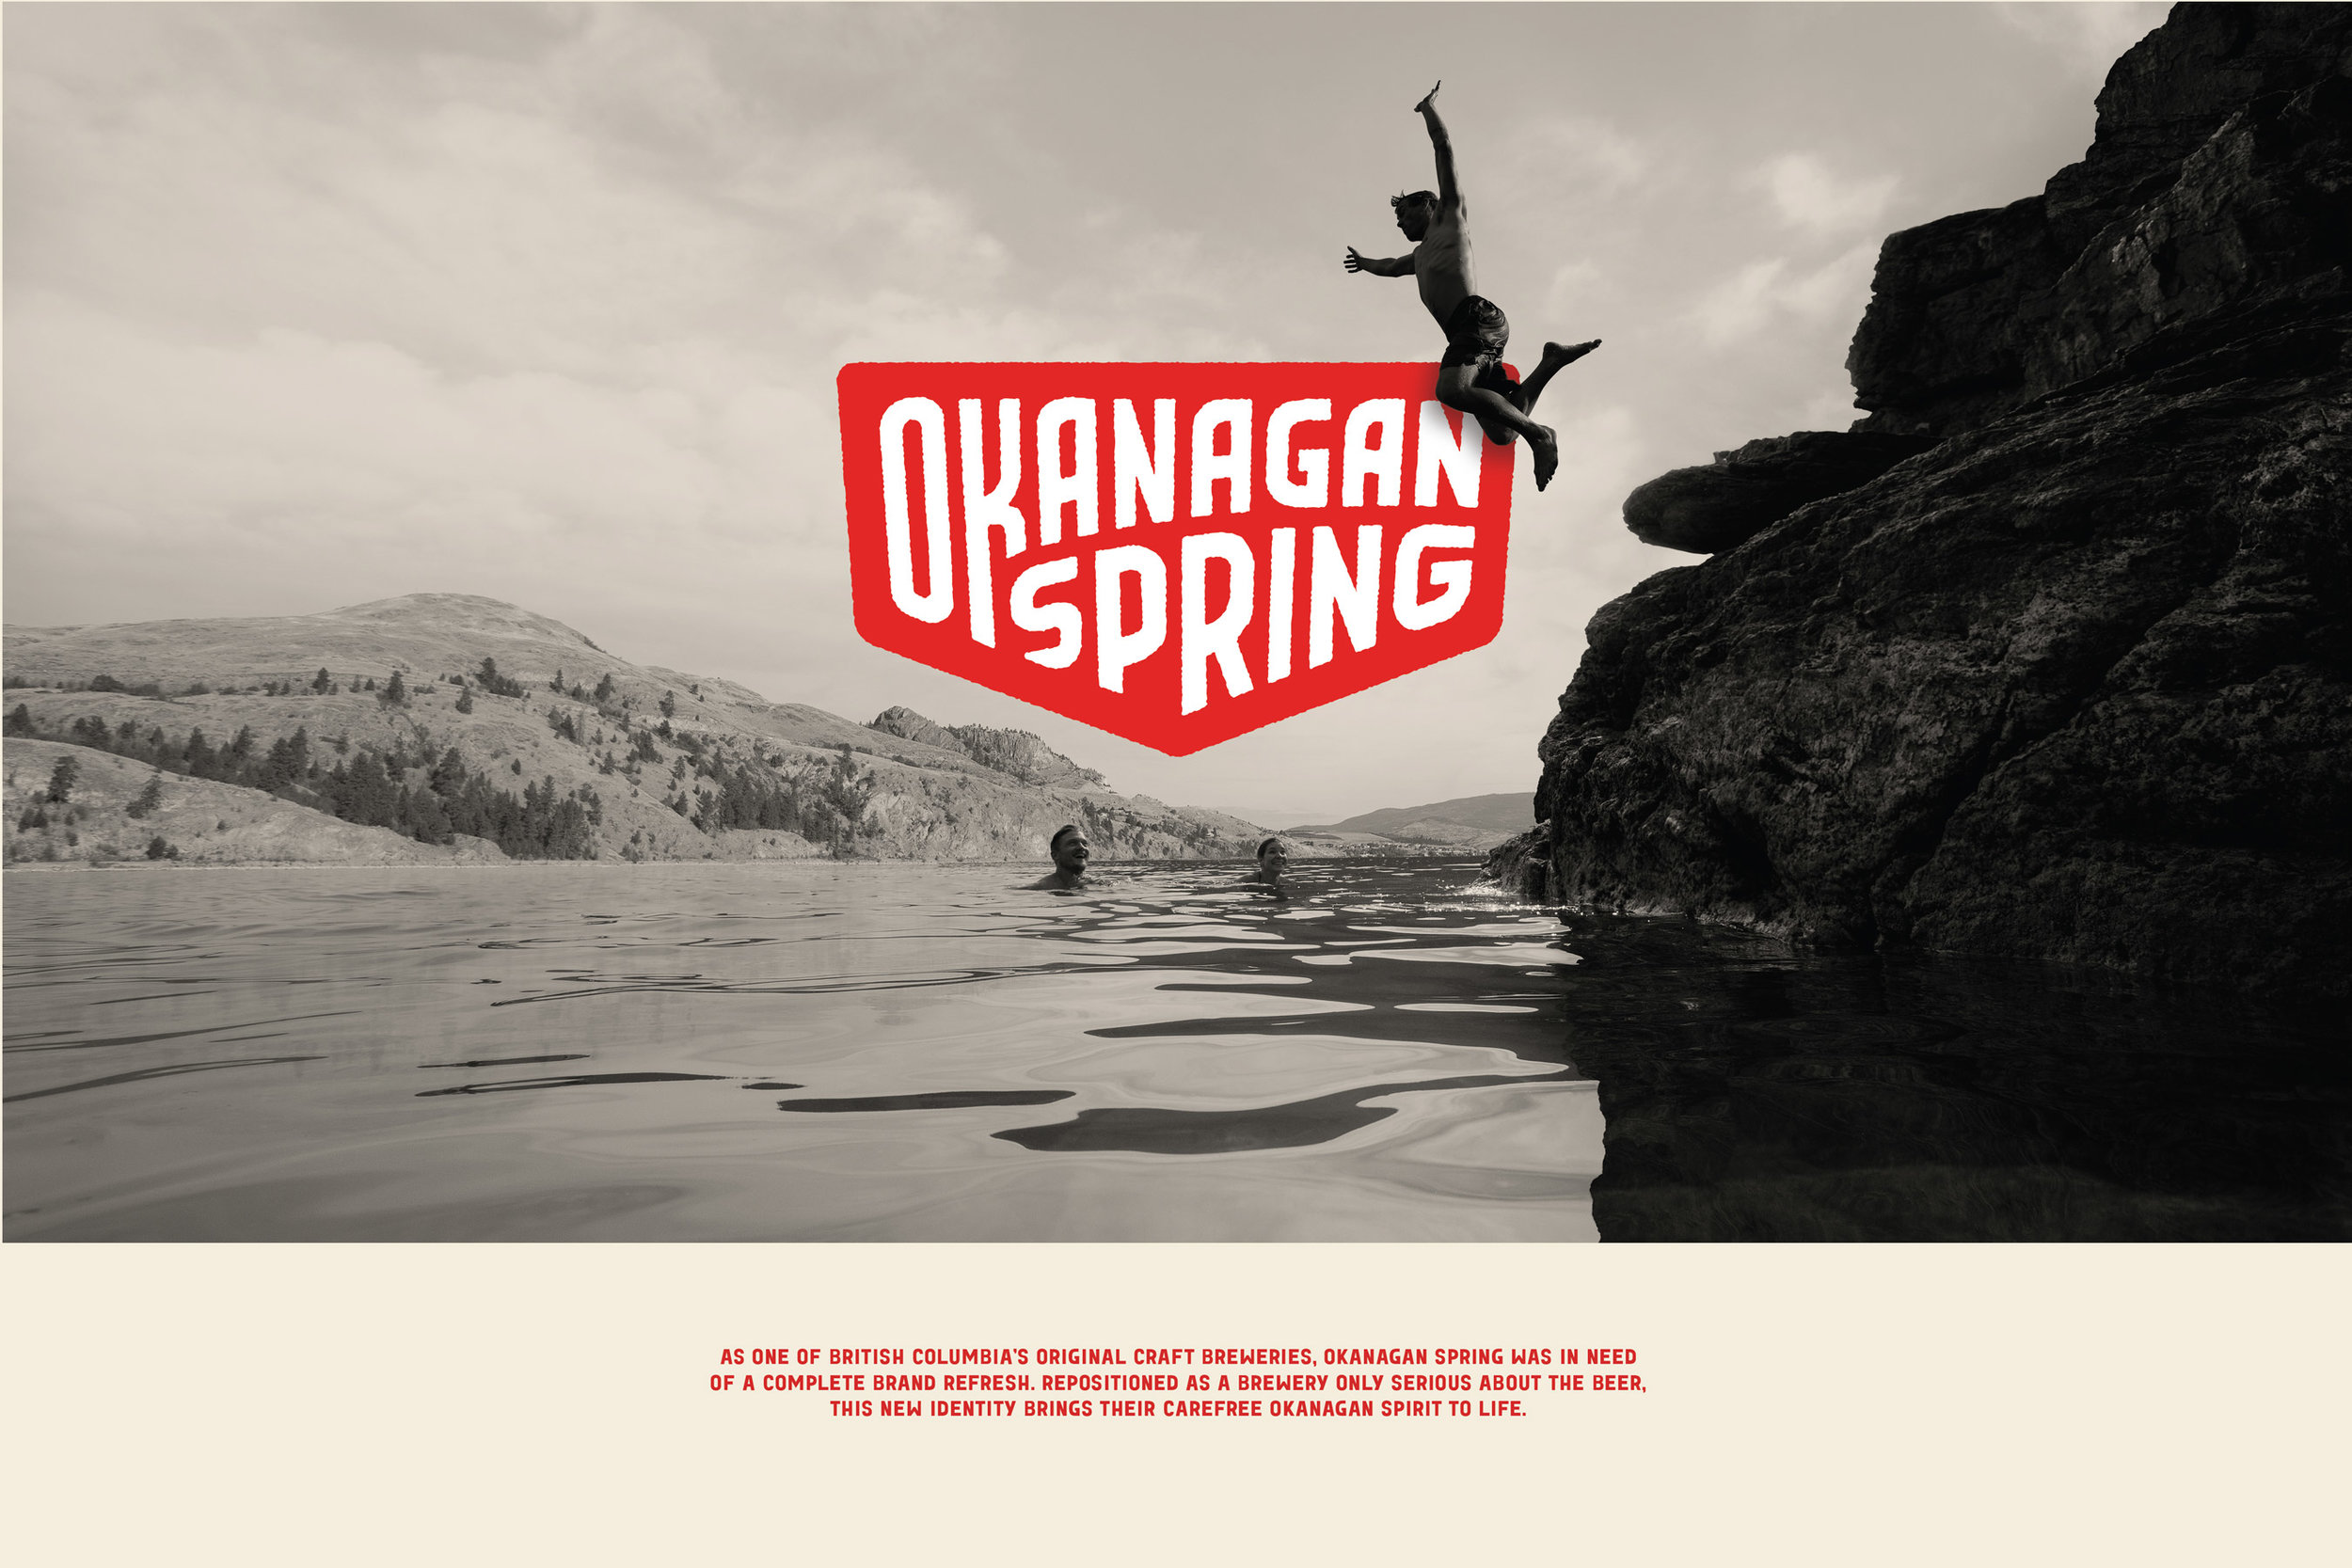 OkanaganSprings-2018-Identity-12x18-1of5.jpg